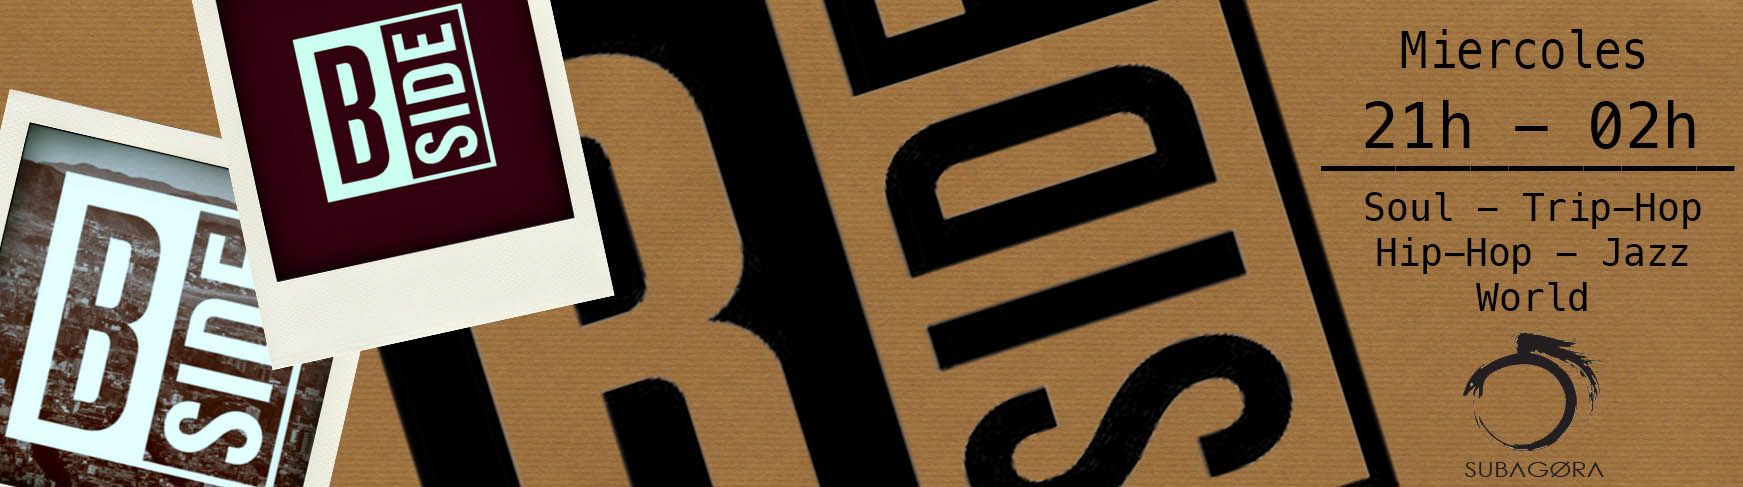 "B-Side Barcelona: El ""Rendez-vous"" experimental de los miercoles @ Guzzo"